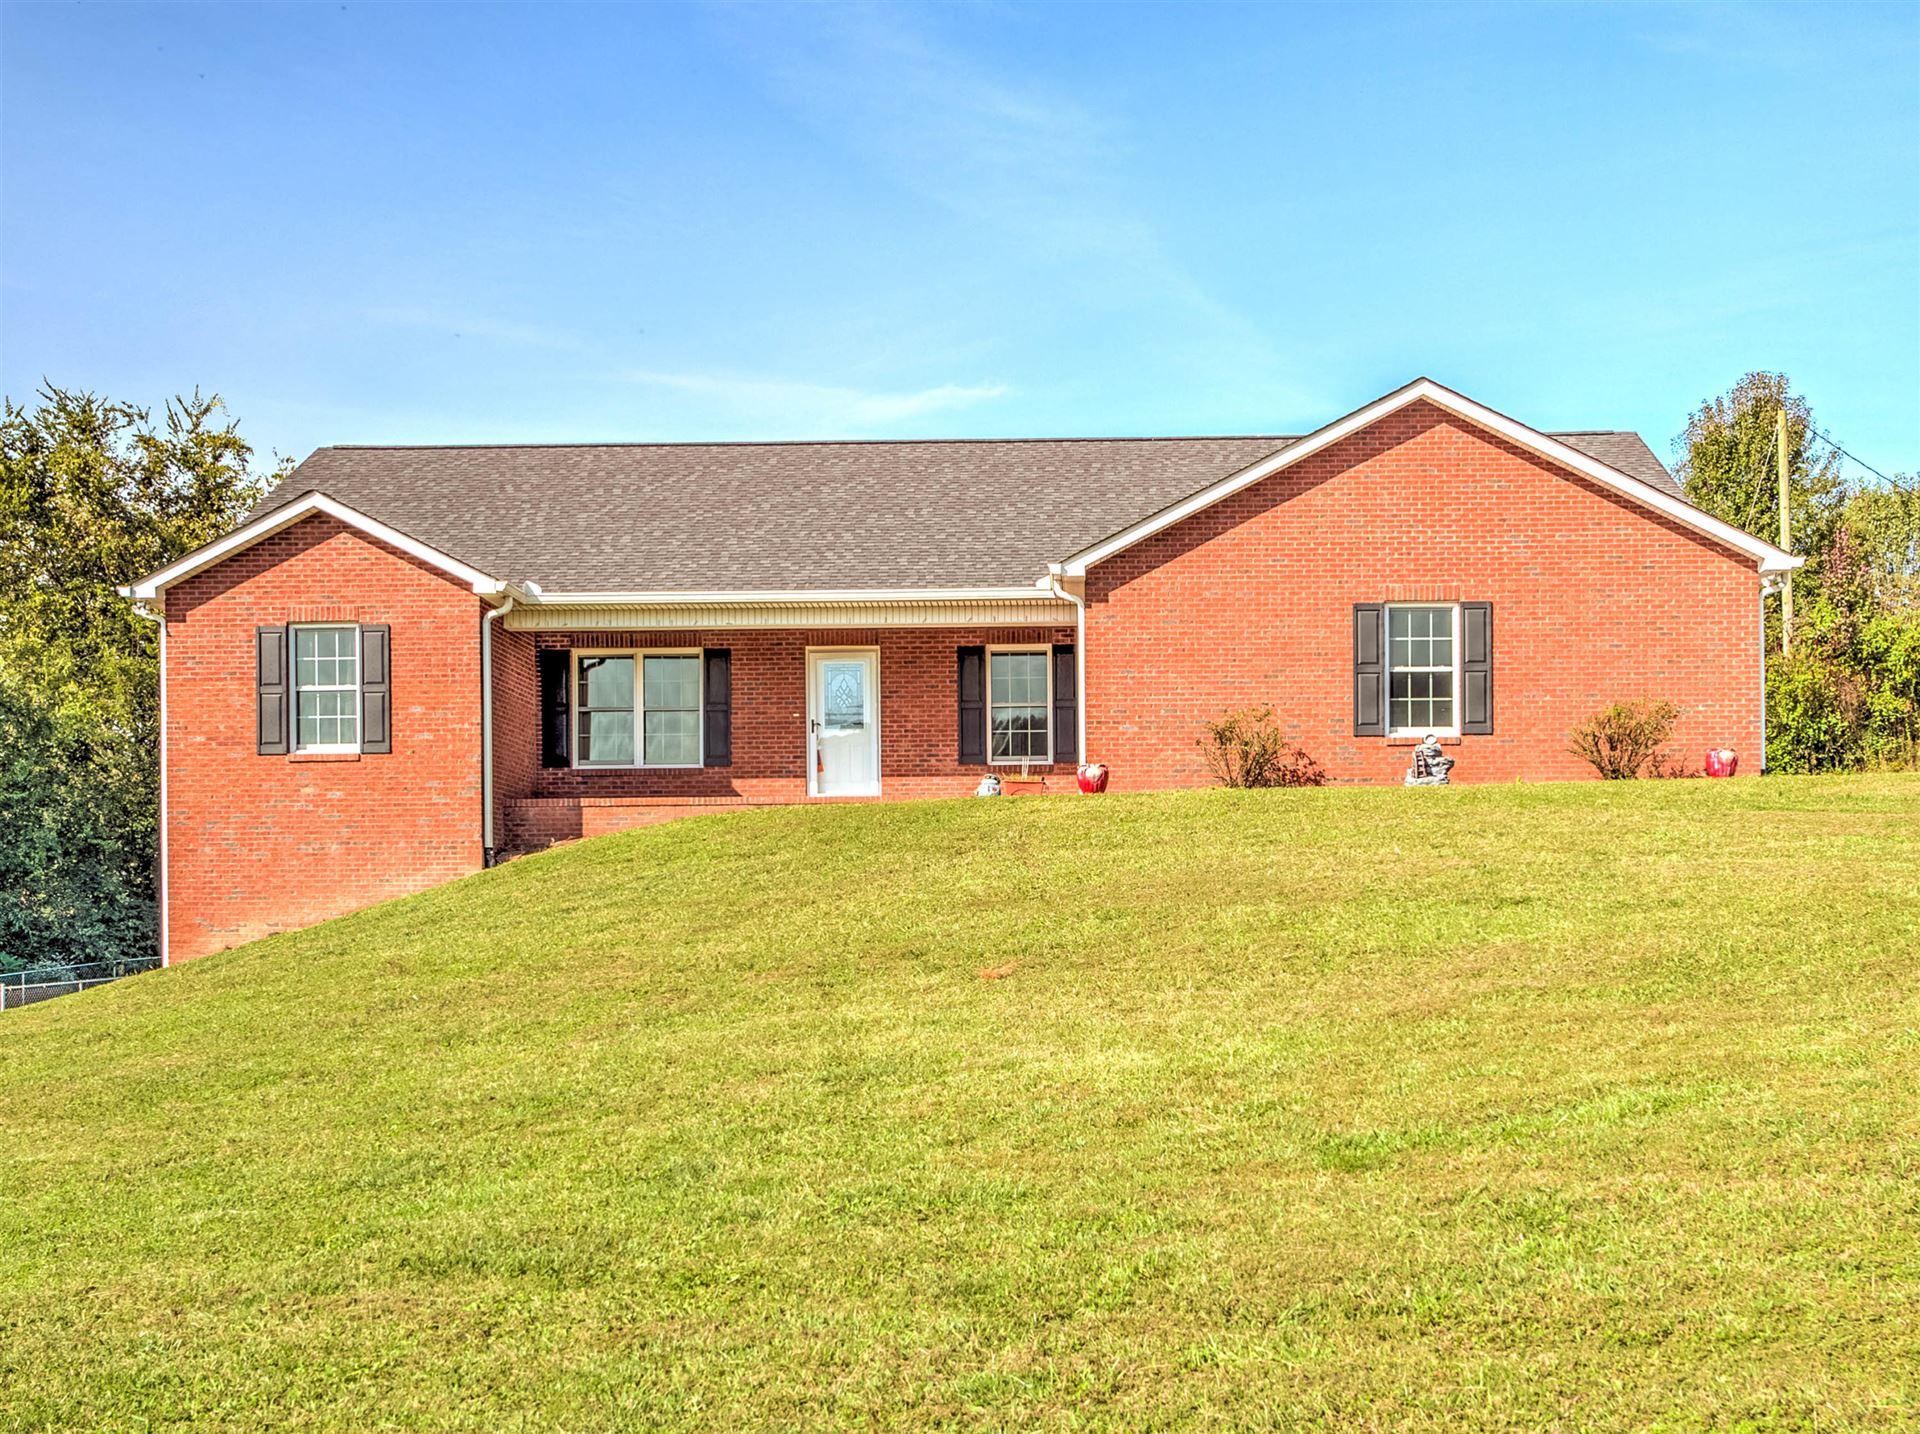 Photo of 513 Laurel Rd, Clinton, TN 37716 (MLS # 1132003)